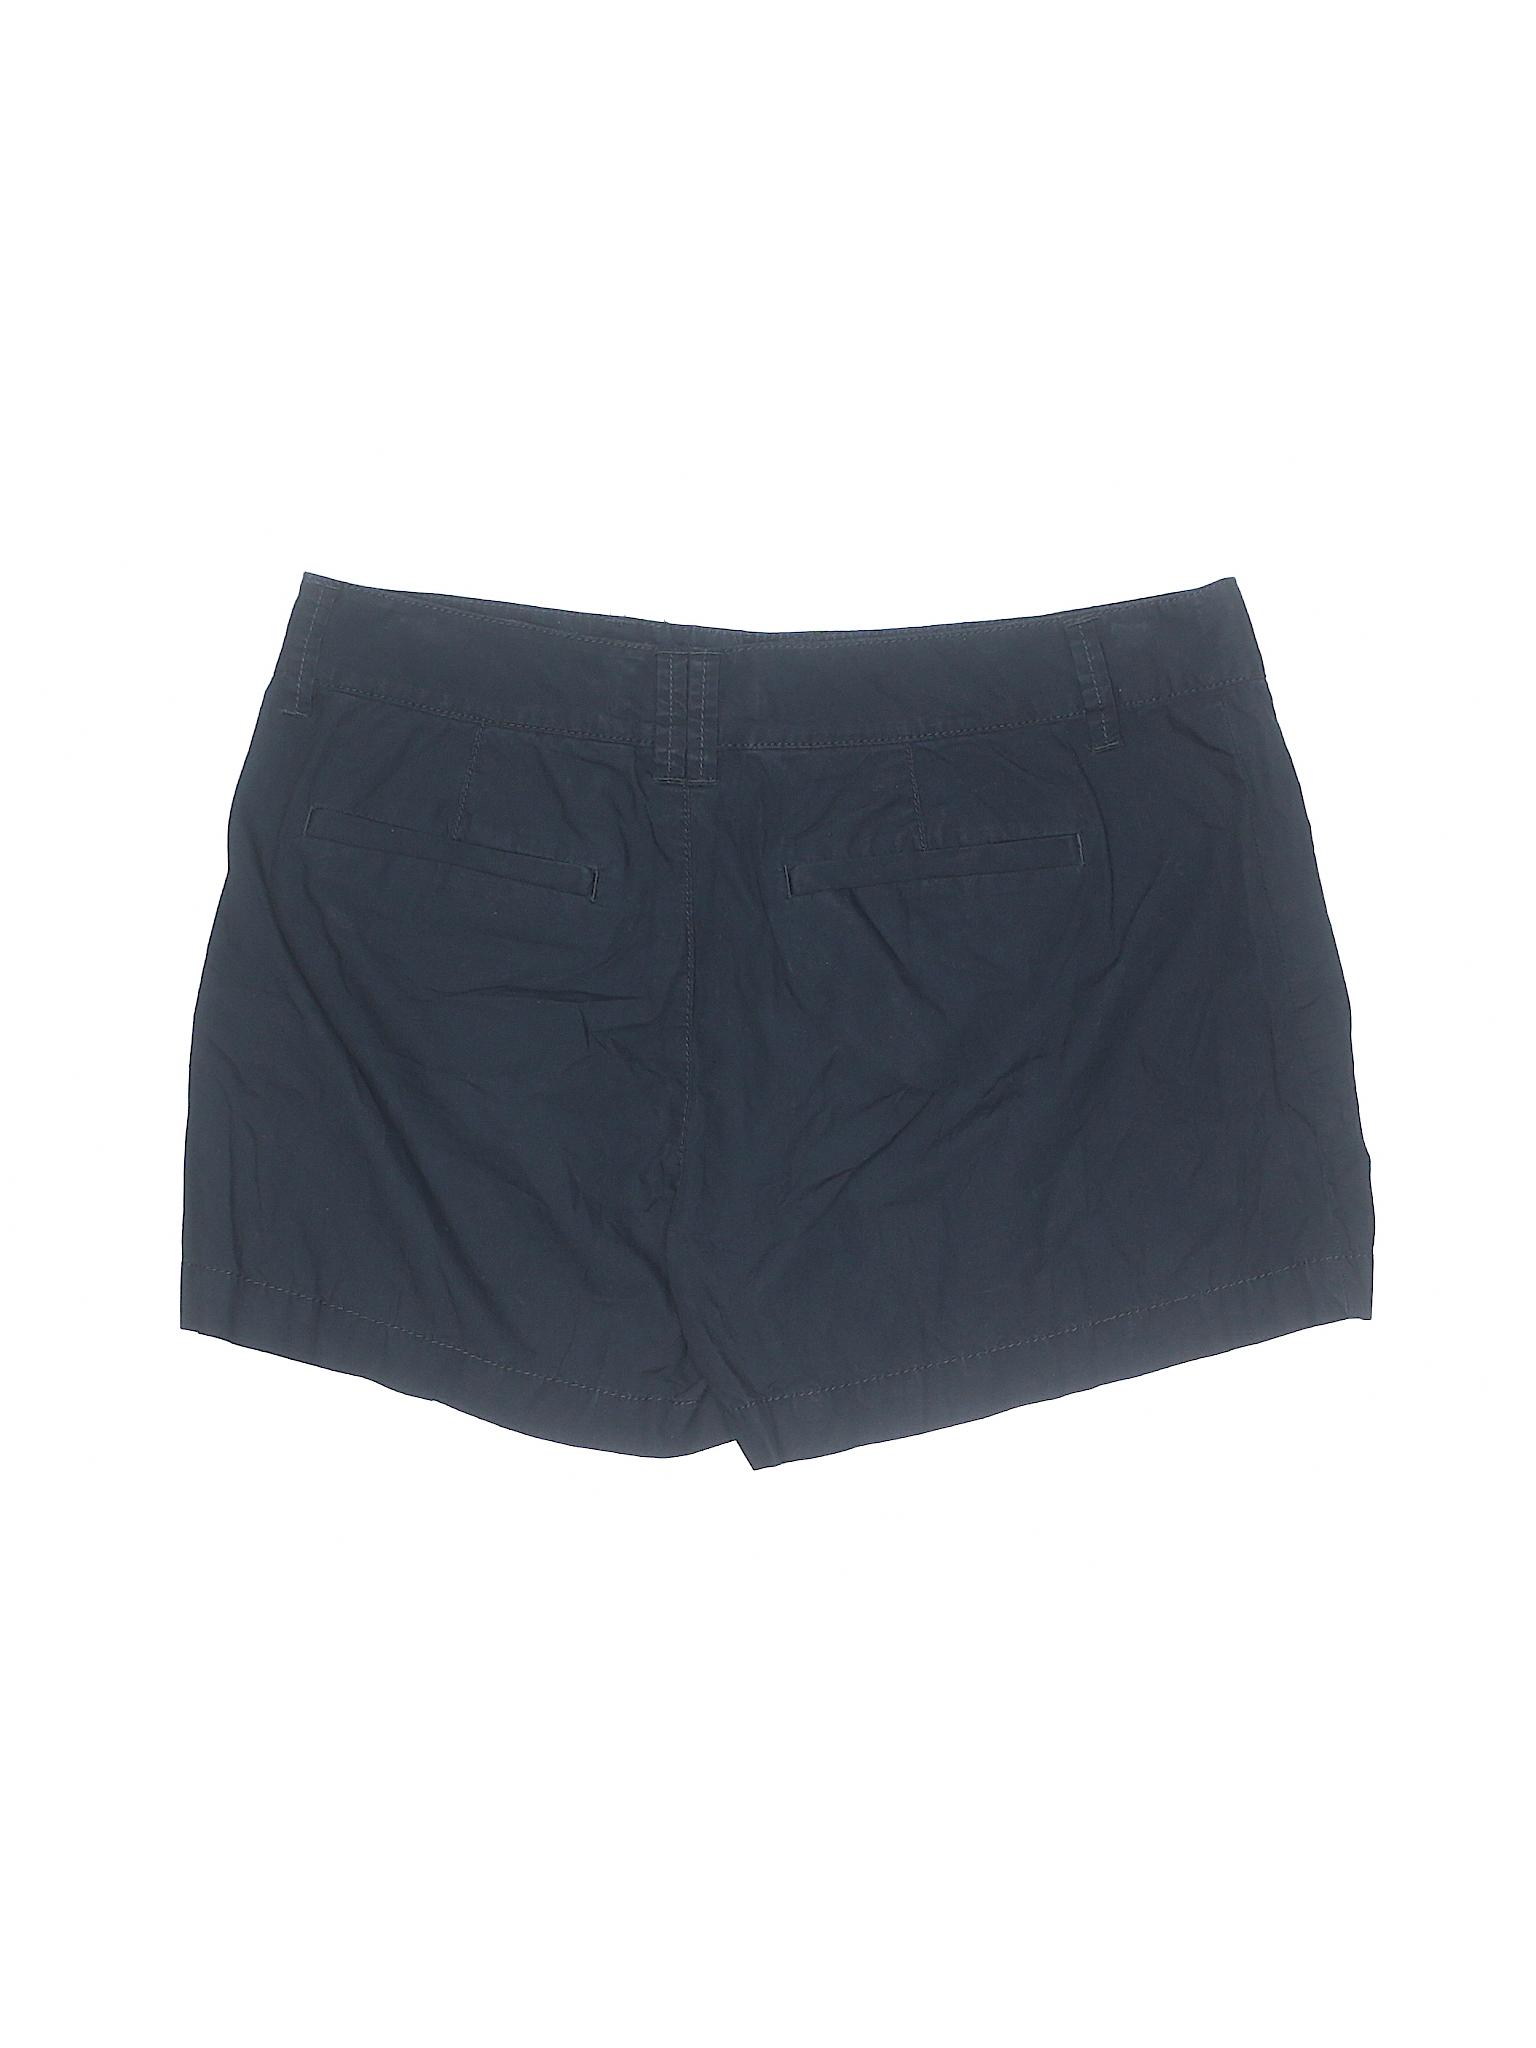 Khaki LOFT Boutique Shorts Ann Taylor q6ZtWX6wzS